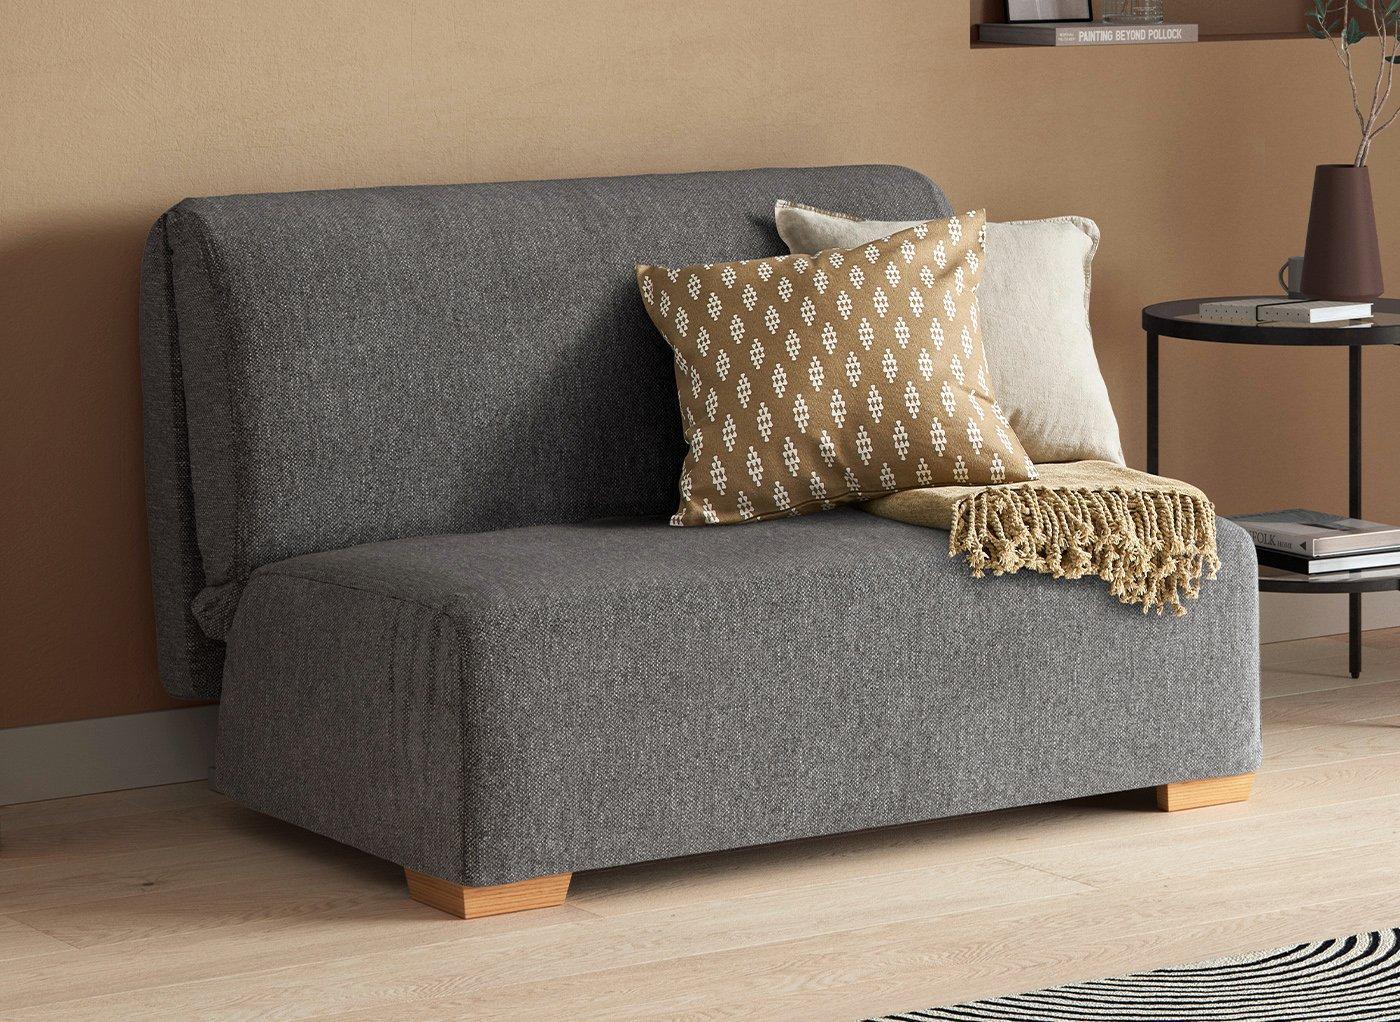 Astounding Cork A Frame Sofa Bed Bralicious Painted Fabric Chair Ideas Braliciousco